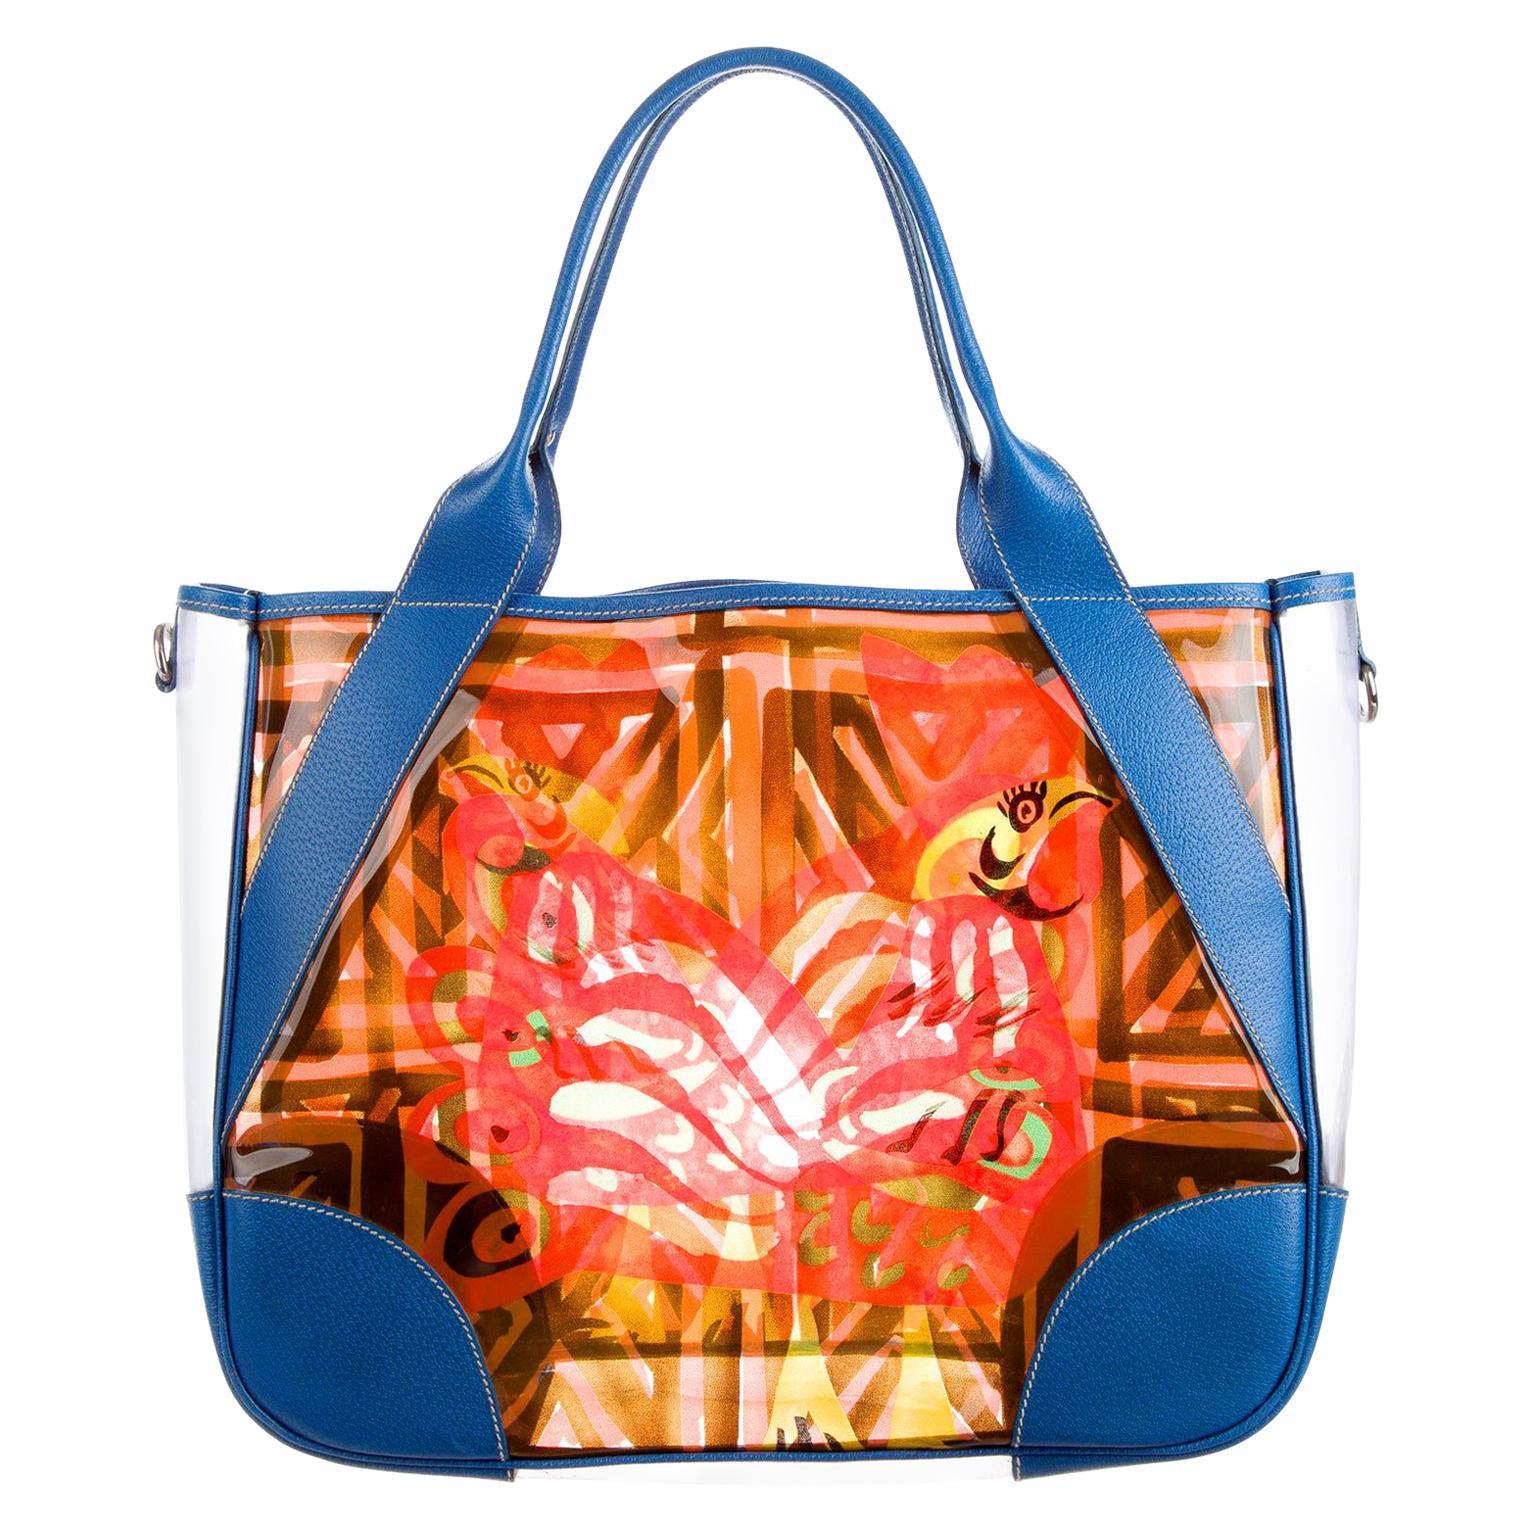 Multicolor Prada Printed PVC Vinyl Beach Bag Tote with Leather Trimming